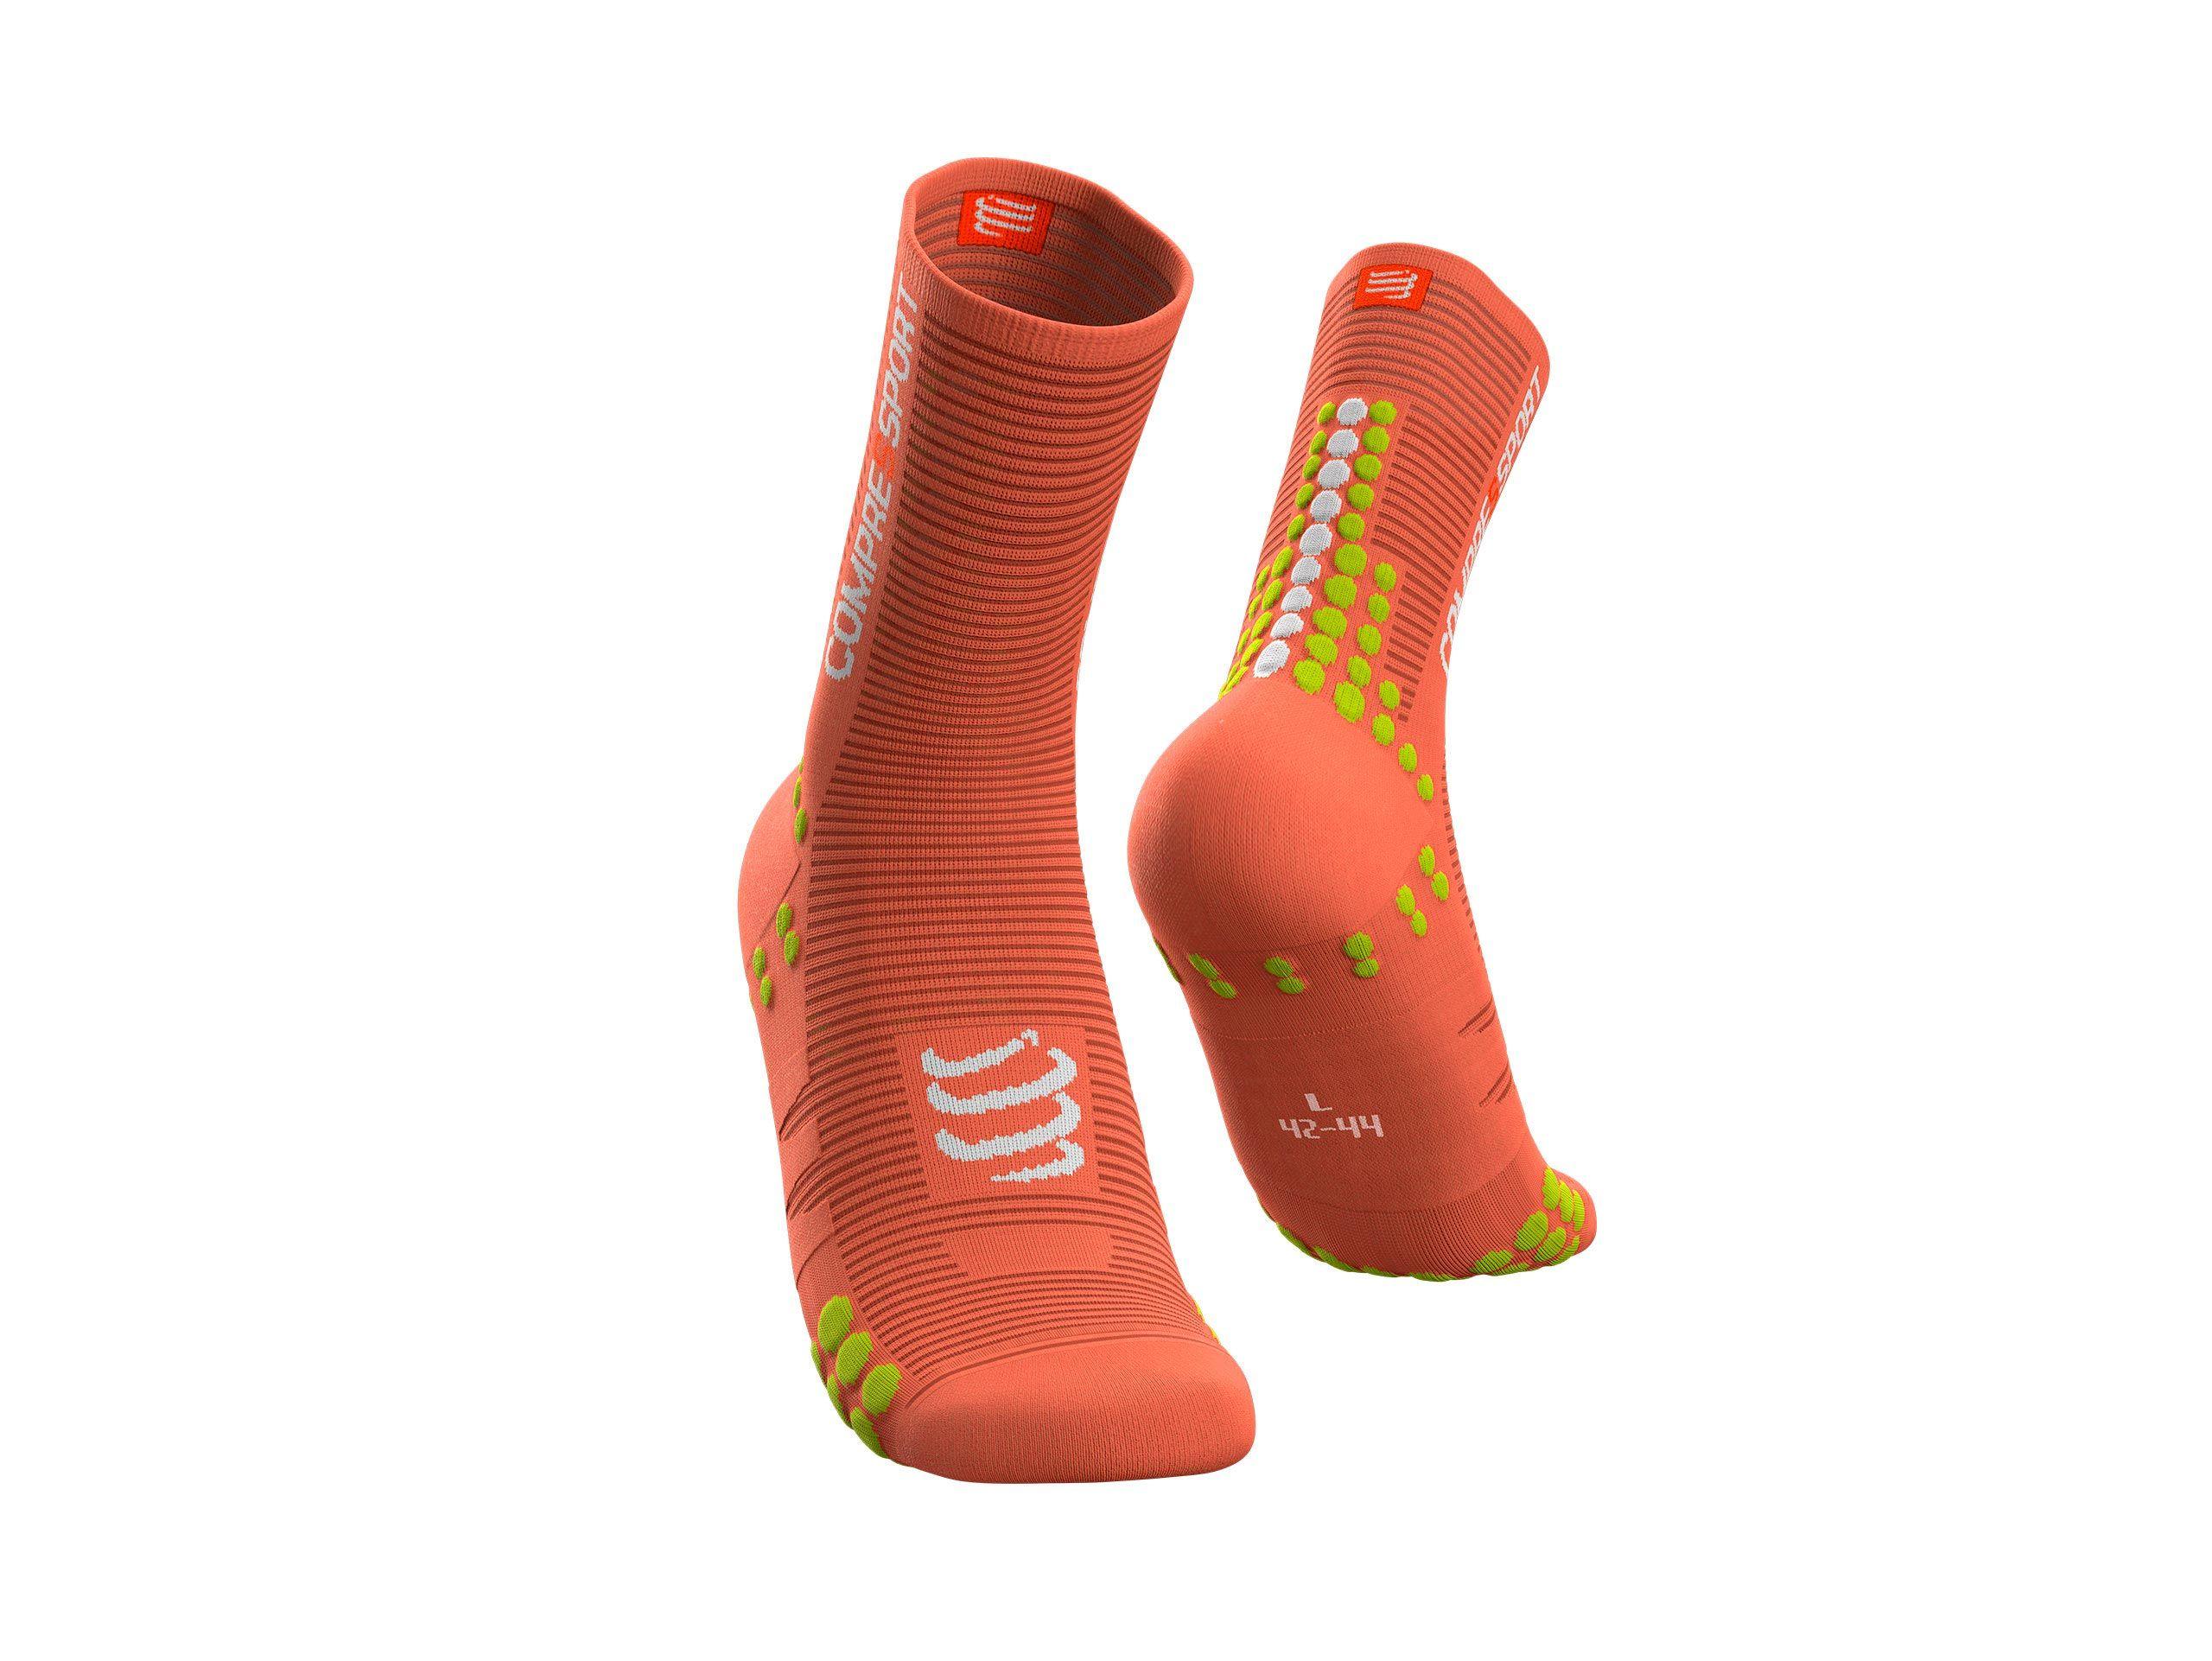 Pro Racing Socks v3.0 Bike - corail